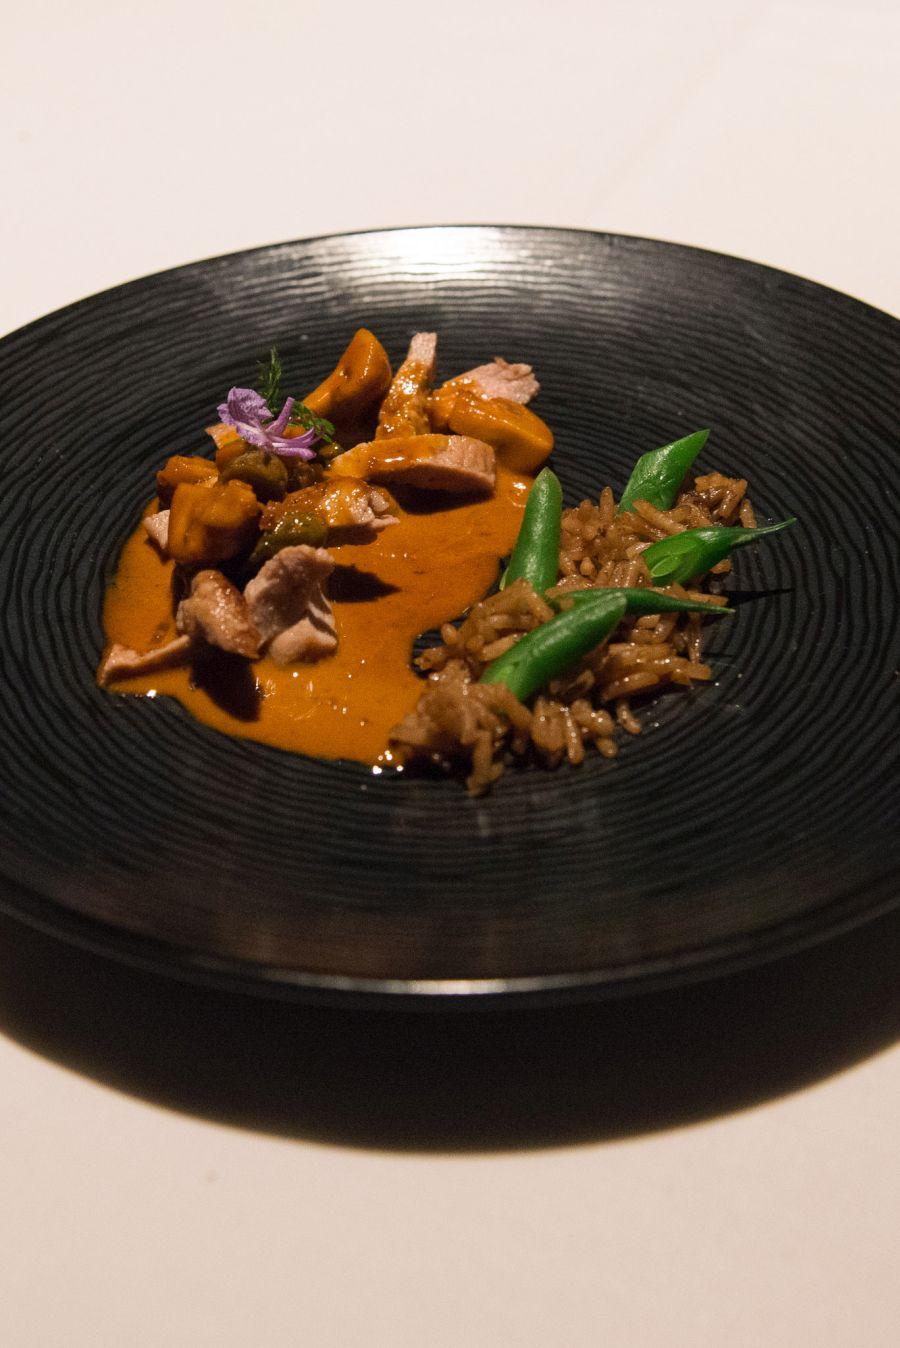 Surprise course: veal in brandy sauce, mushroom rice